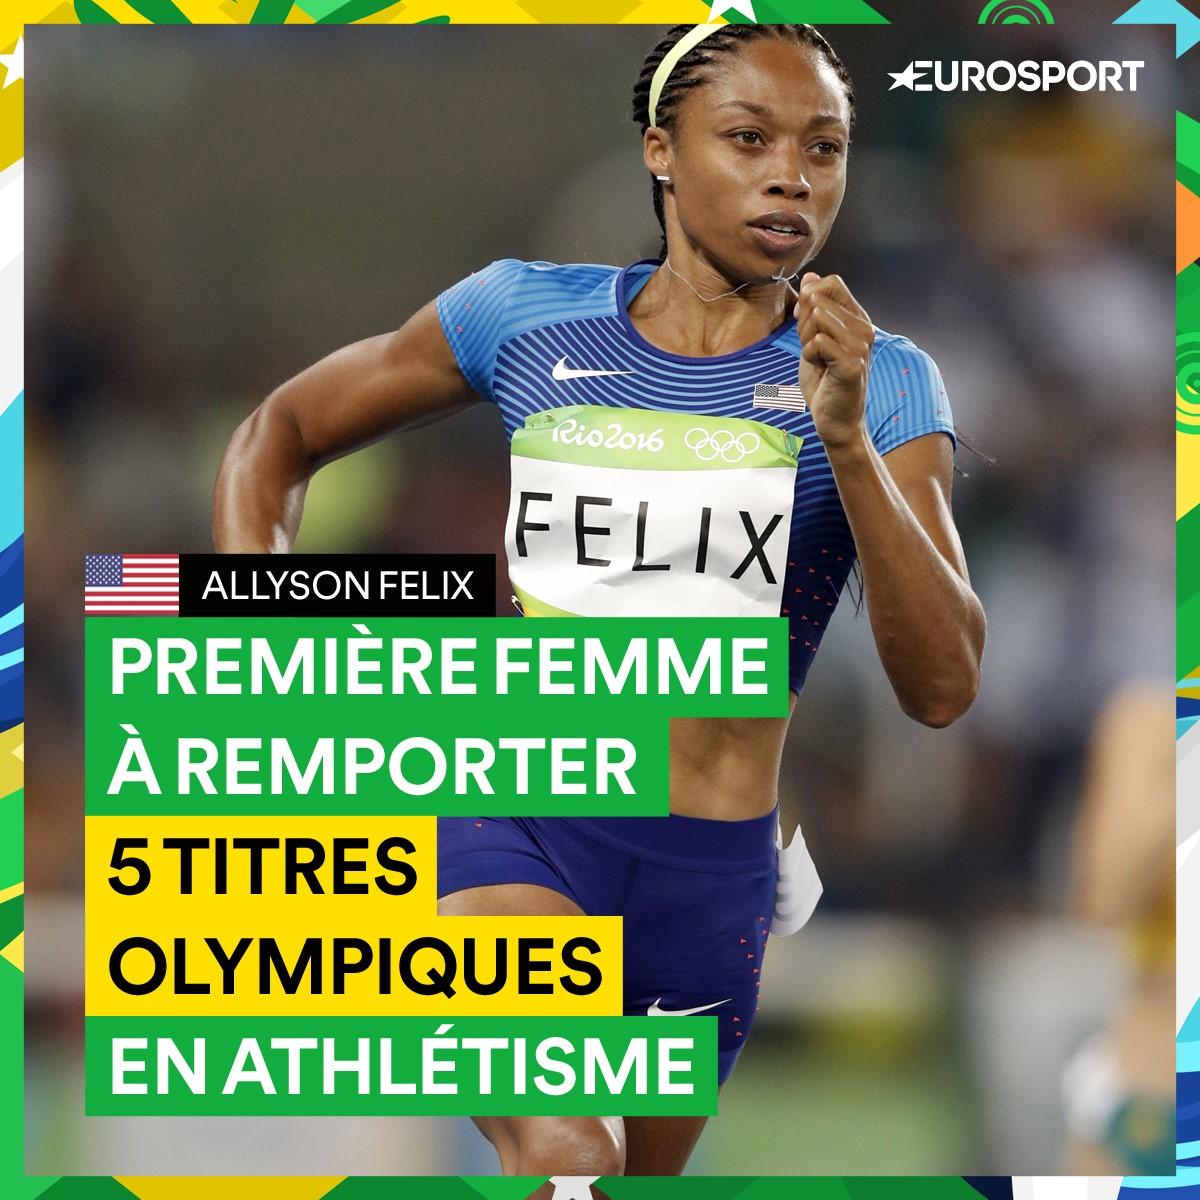 Allyson Felix, 5 titres olympiques